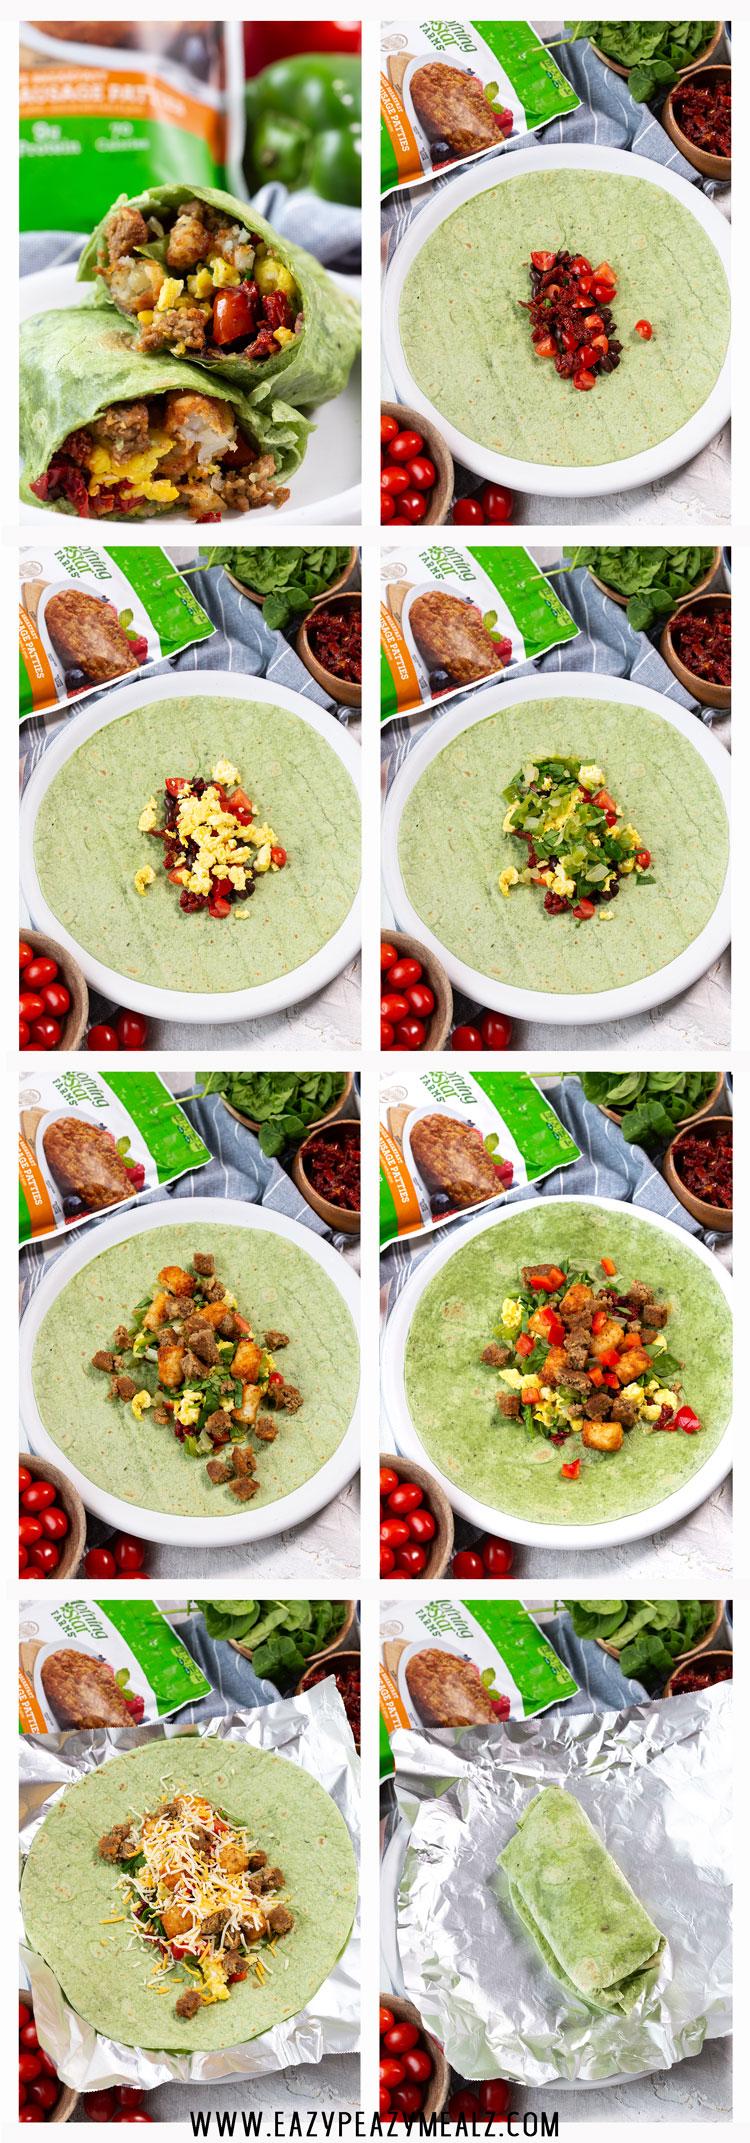 Veggie breakfast burritos step by step photos